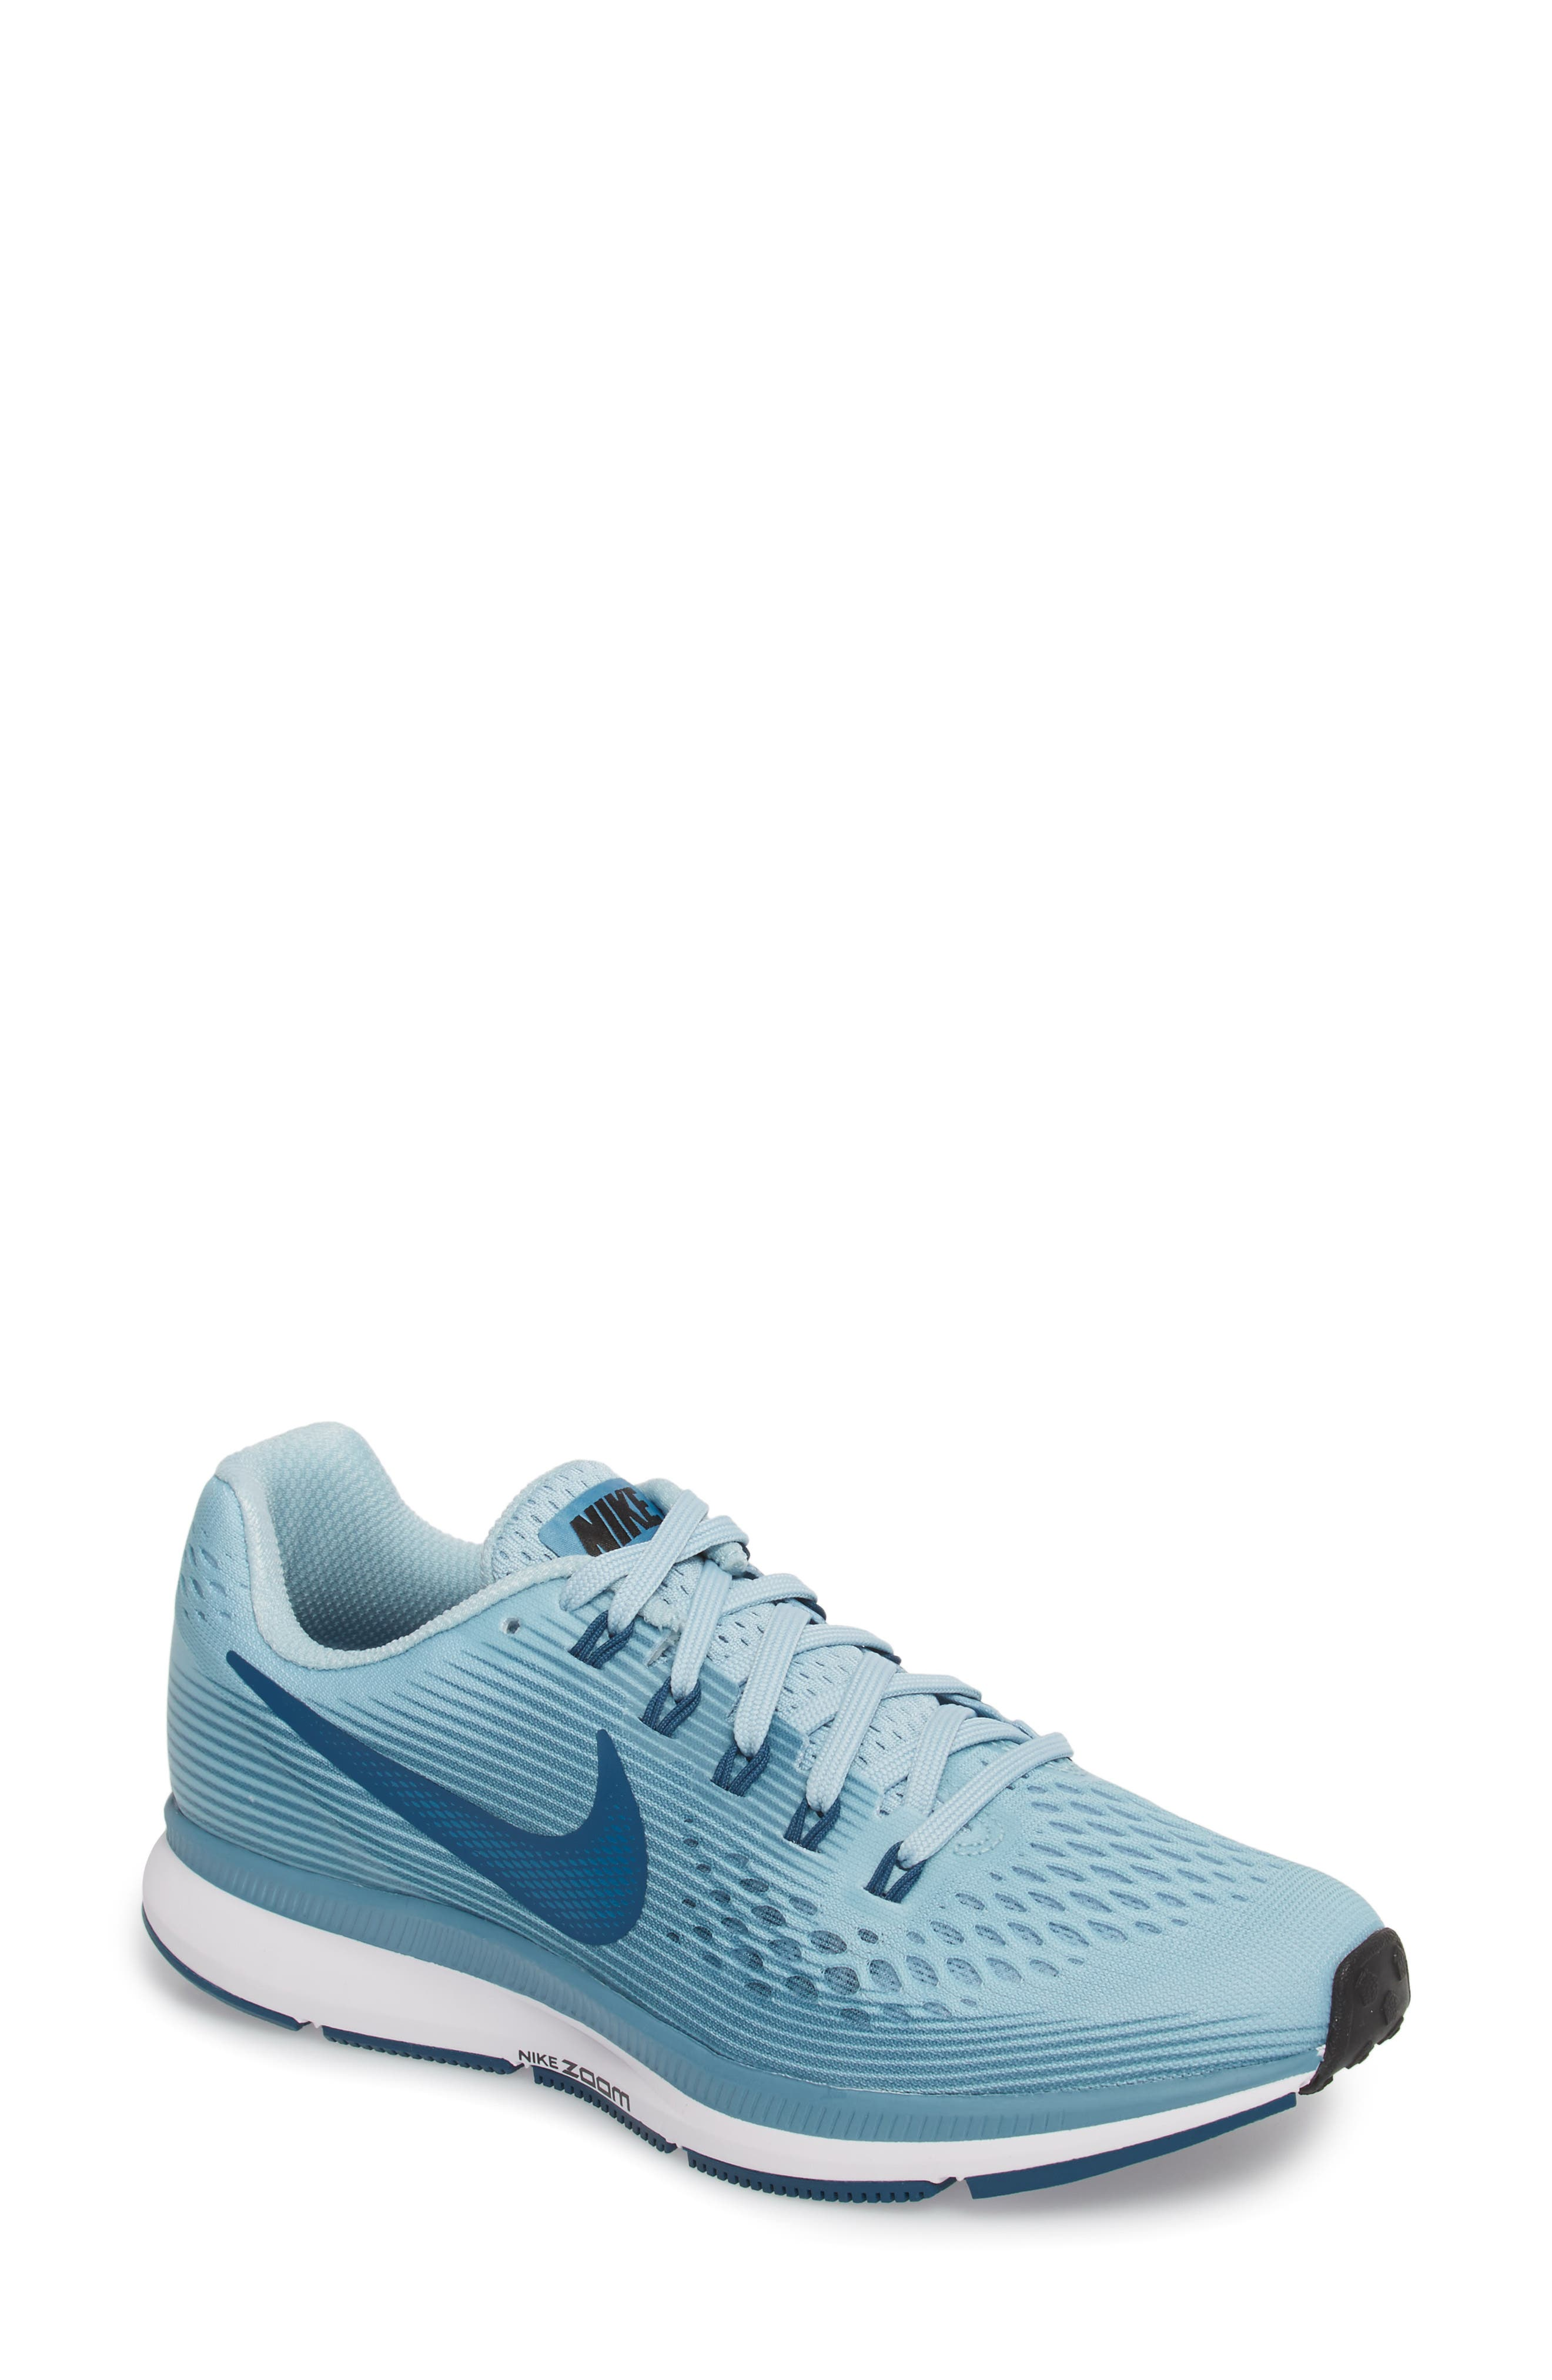 nike tennis shoes nordstrom